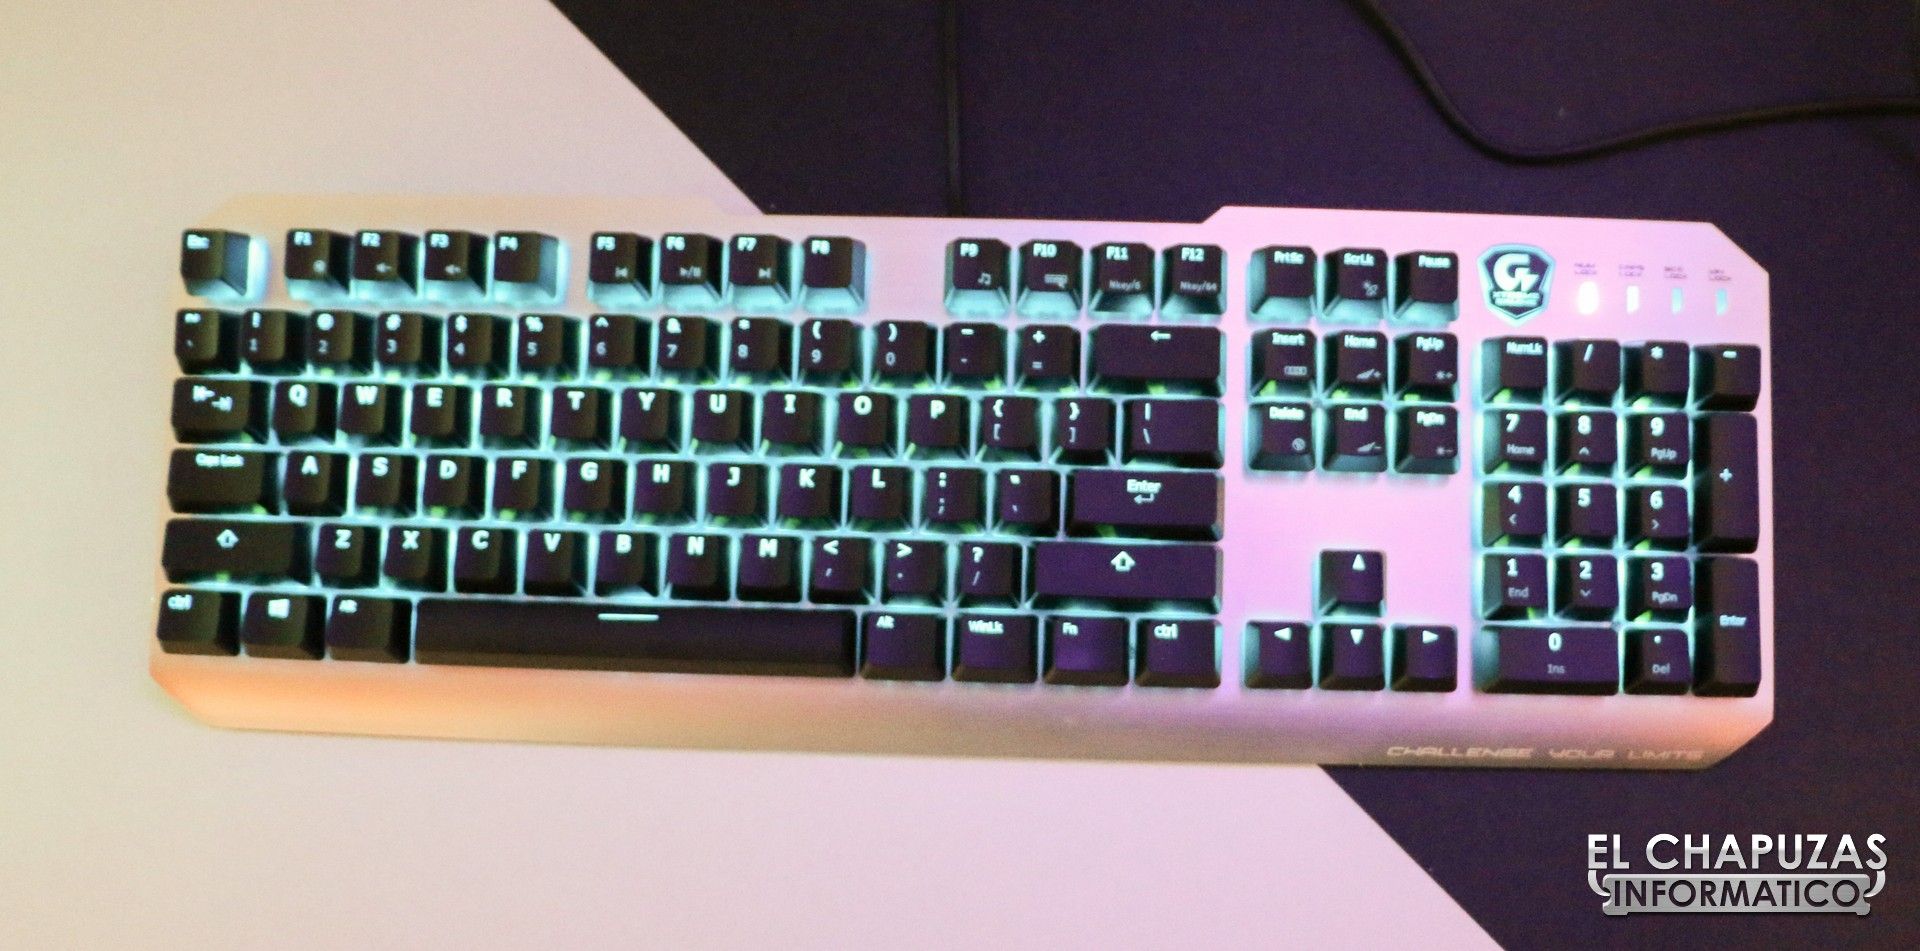 #Computex – Gigabyte XK700, teclado mecánico RGB